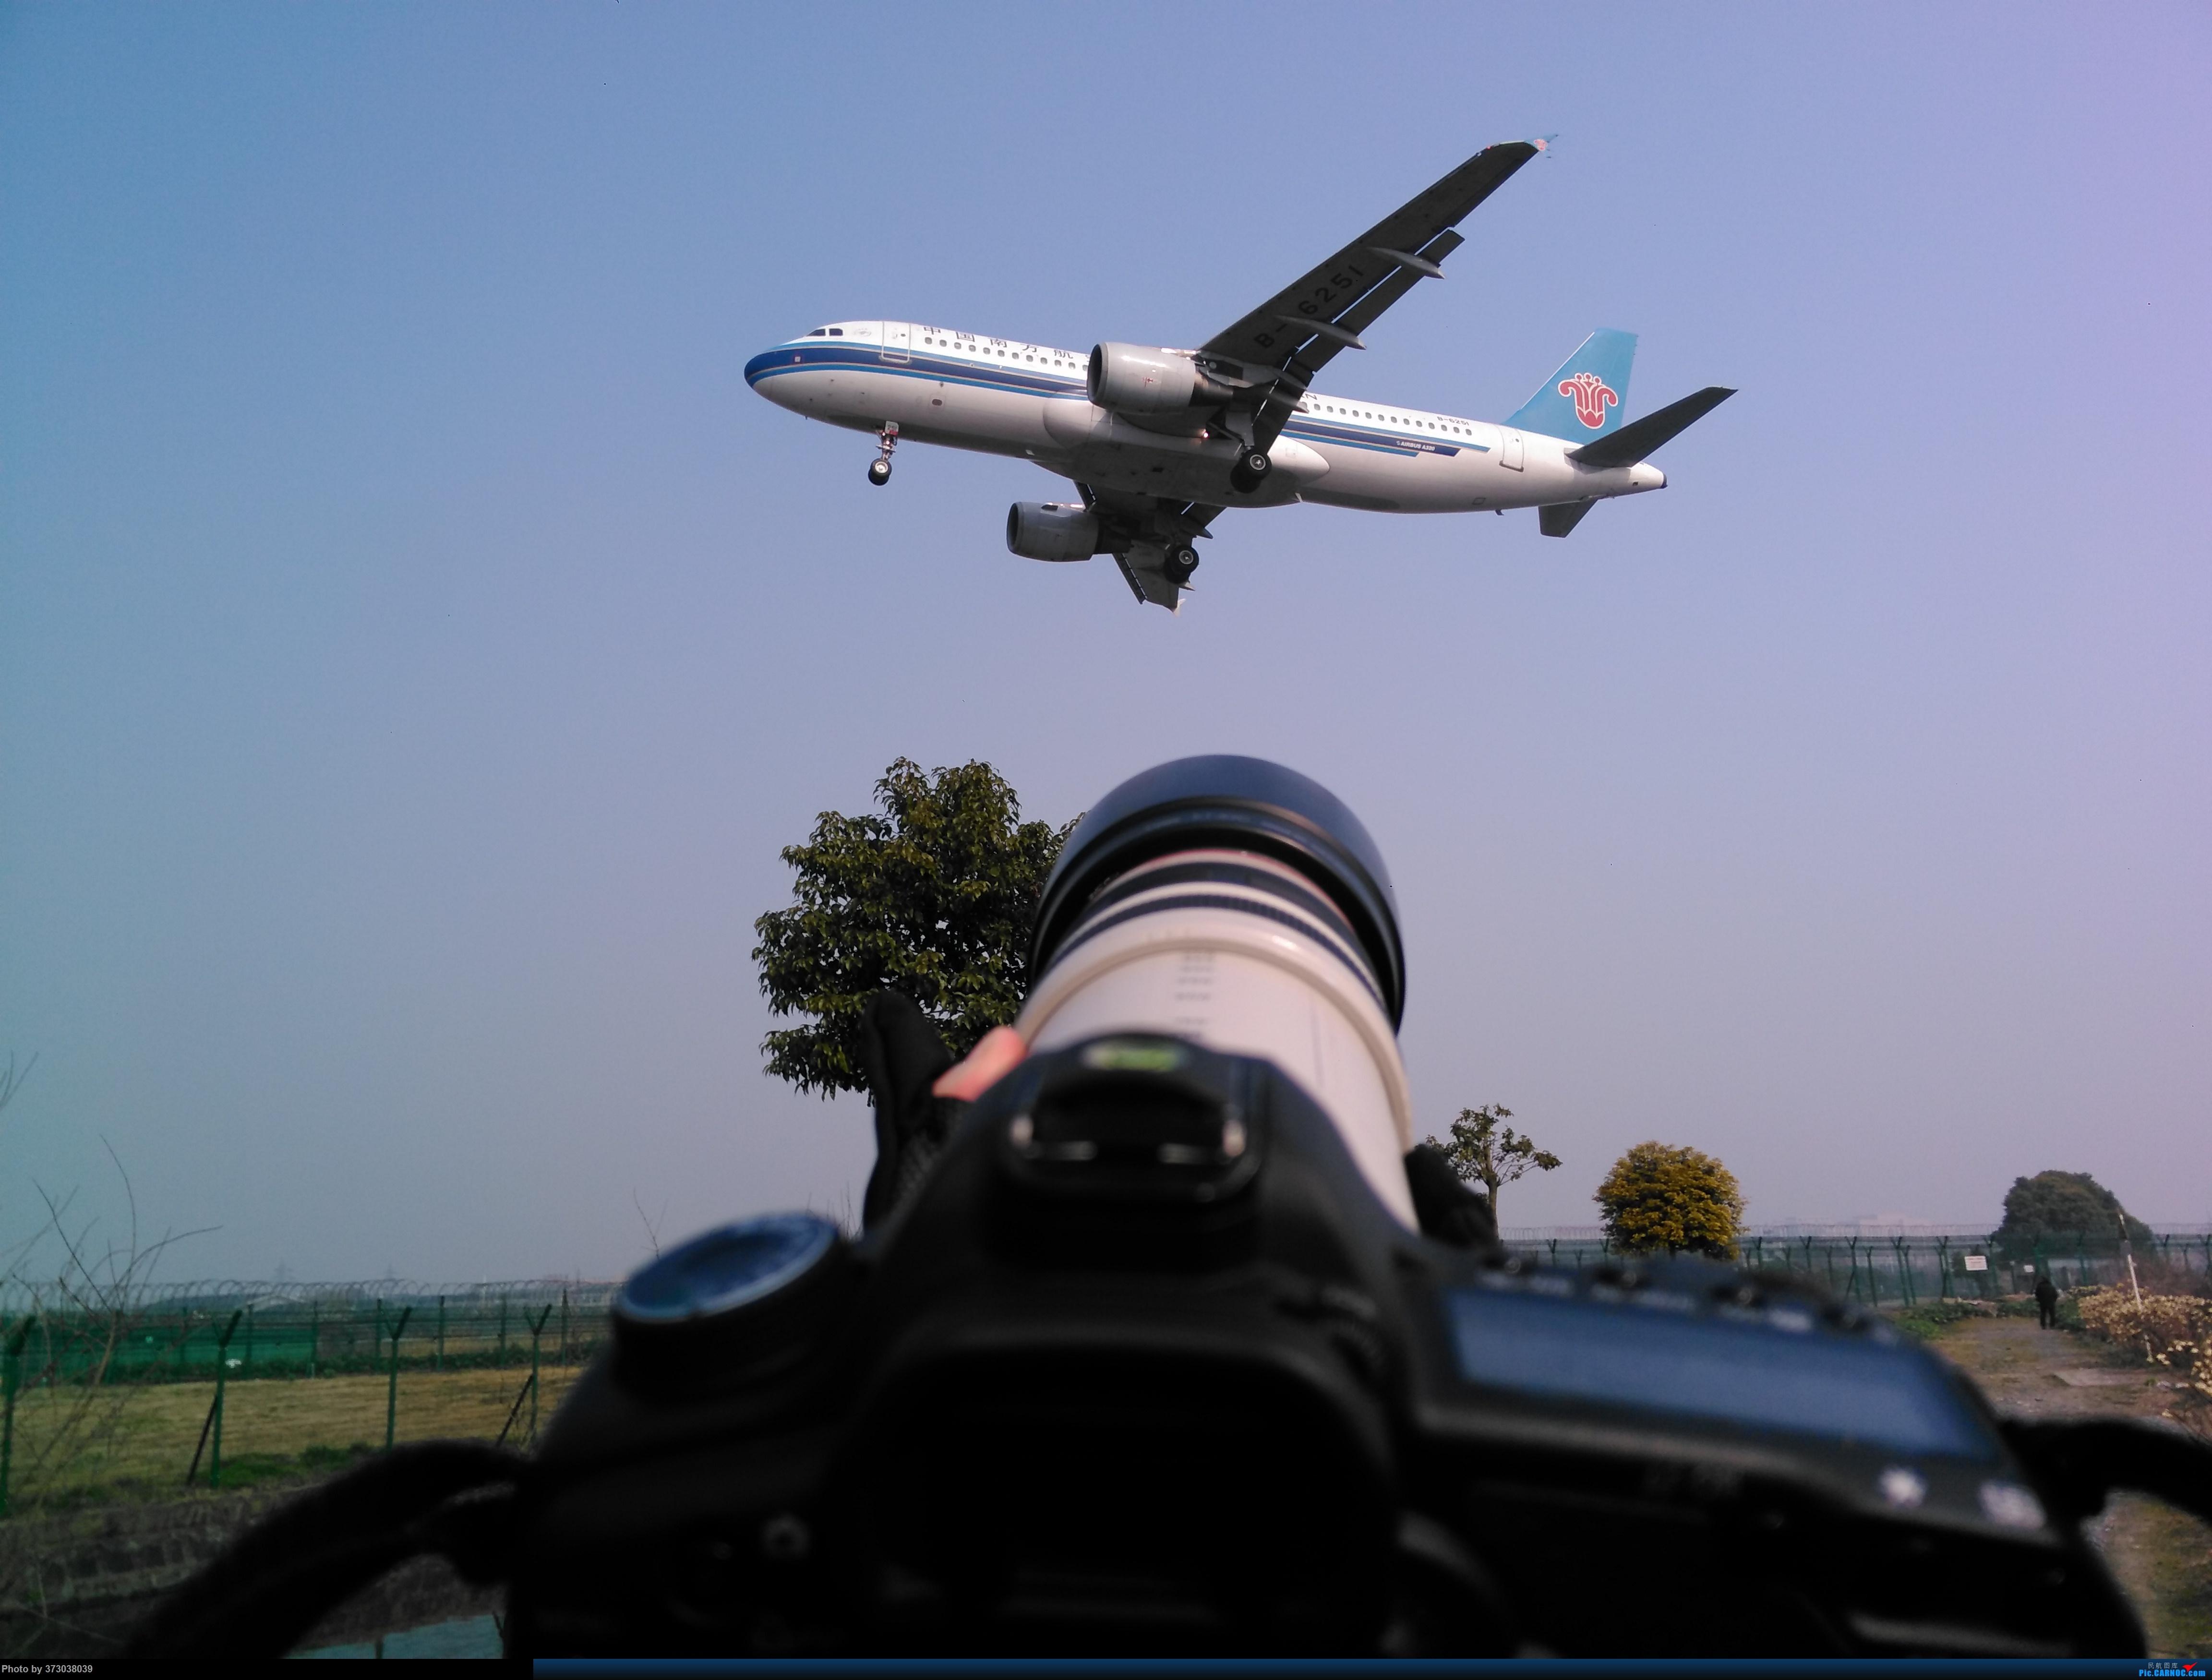 Re:[原创]【杭州飞友会】A320Neo迪士尼杭州萧山机场拍机班门弄斧记    中国杭州萧山国际机场 飞友